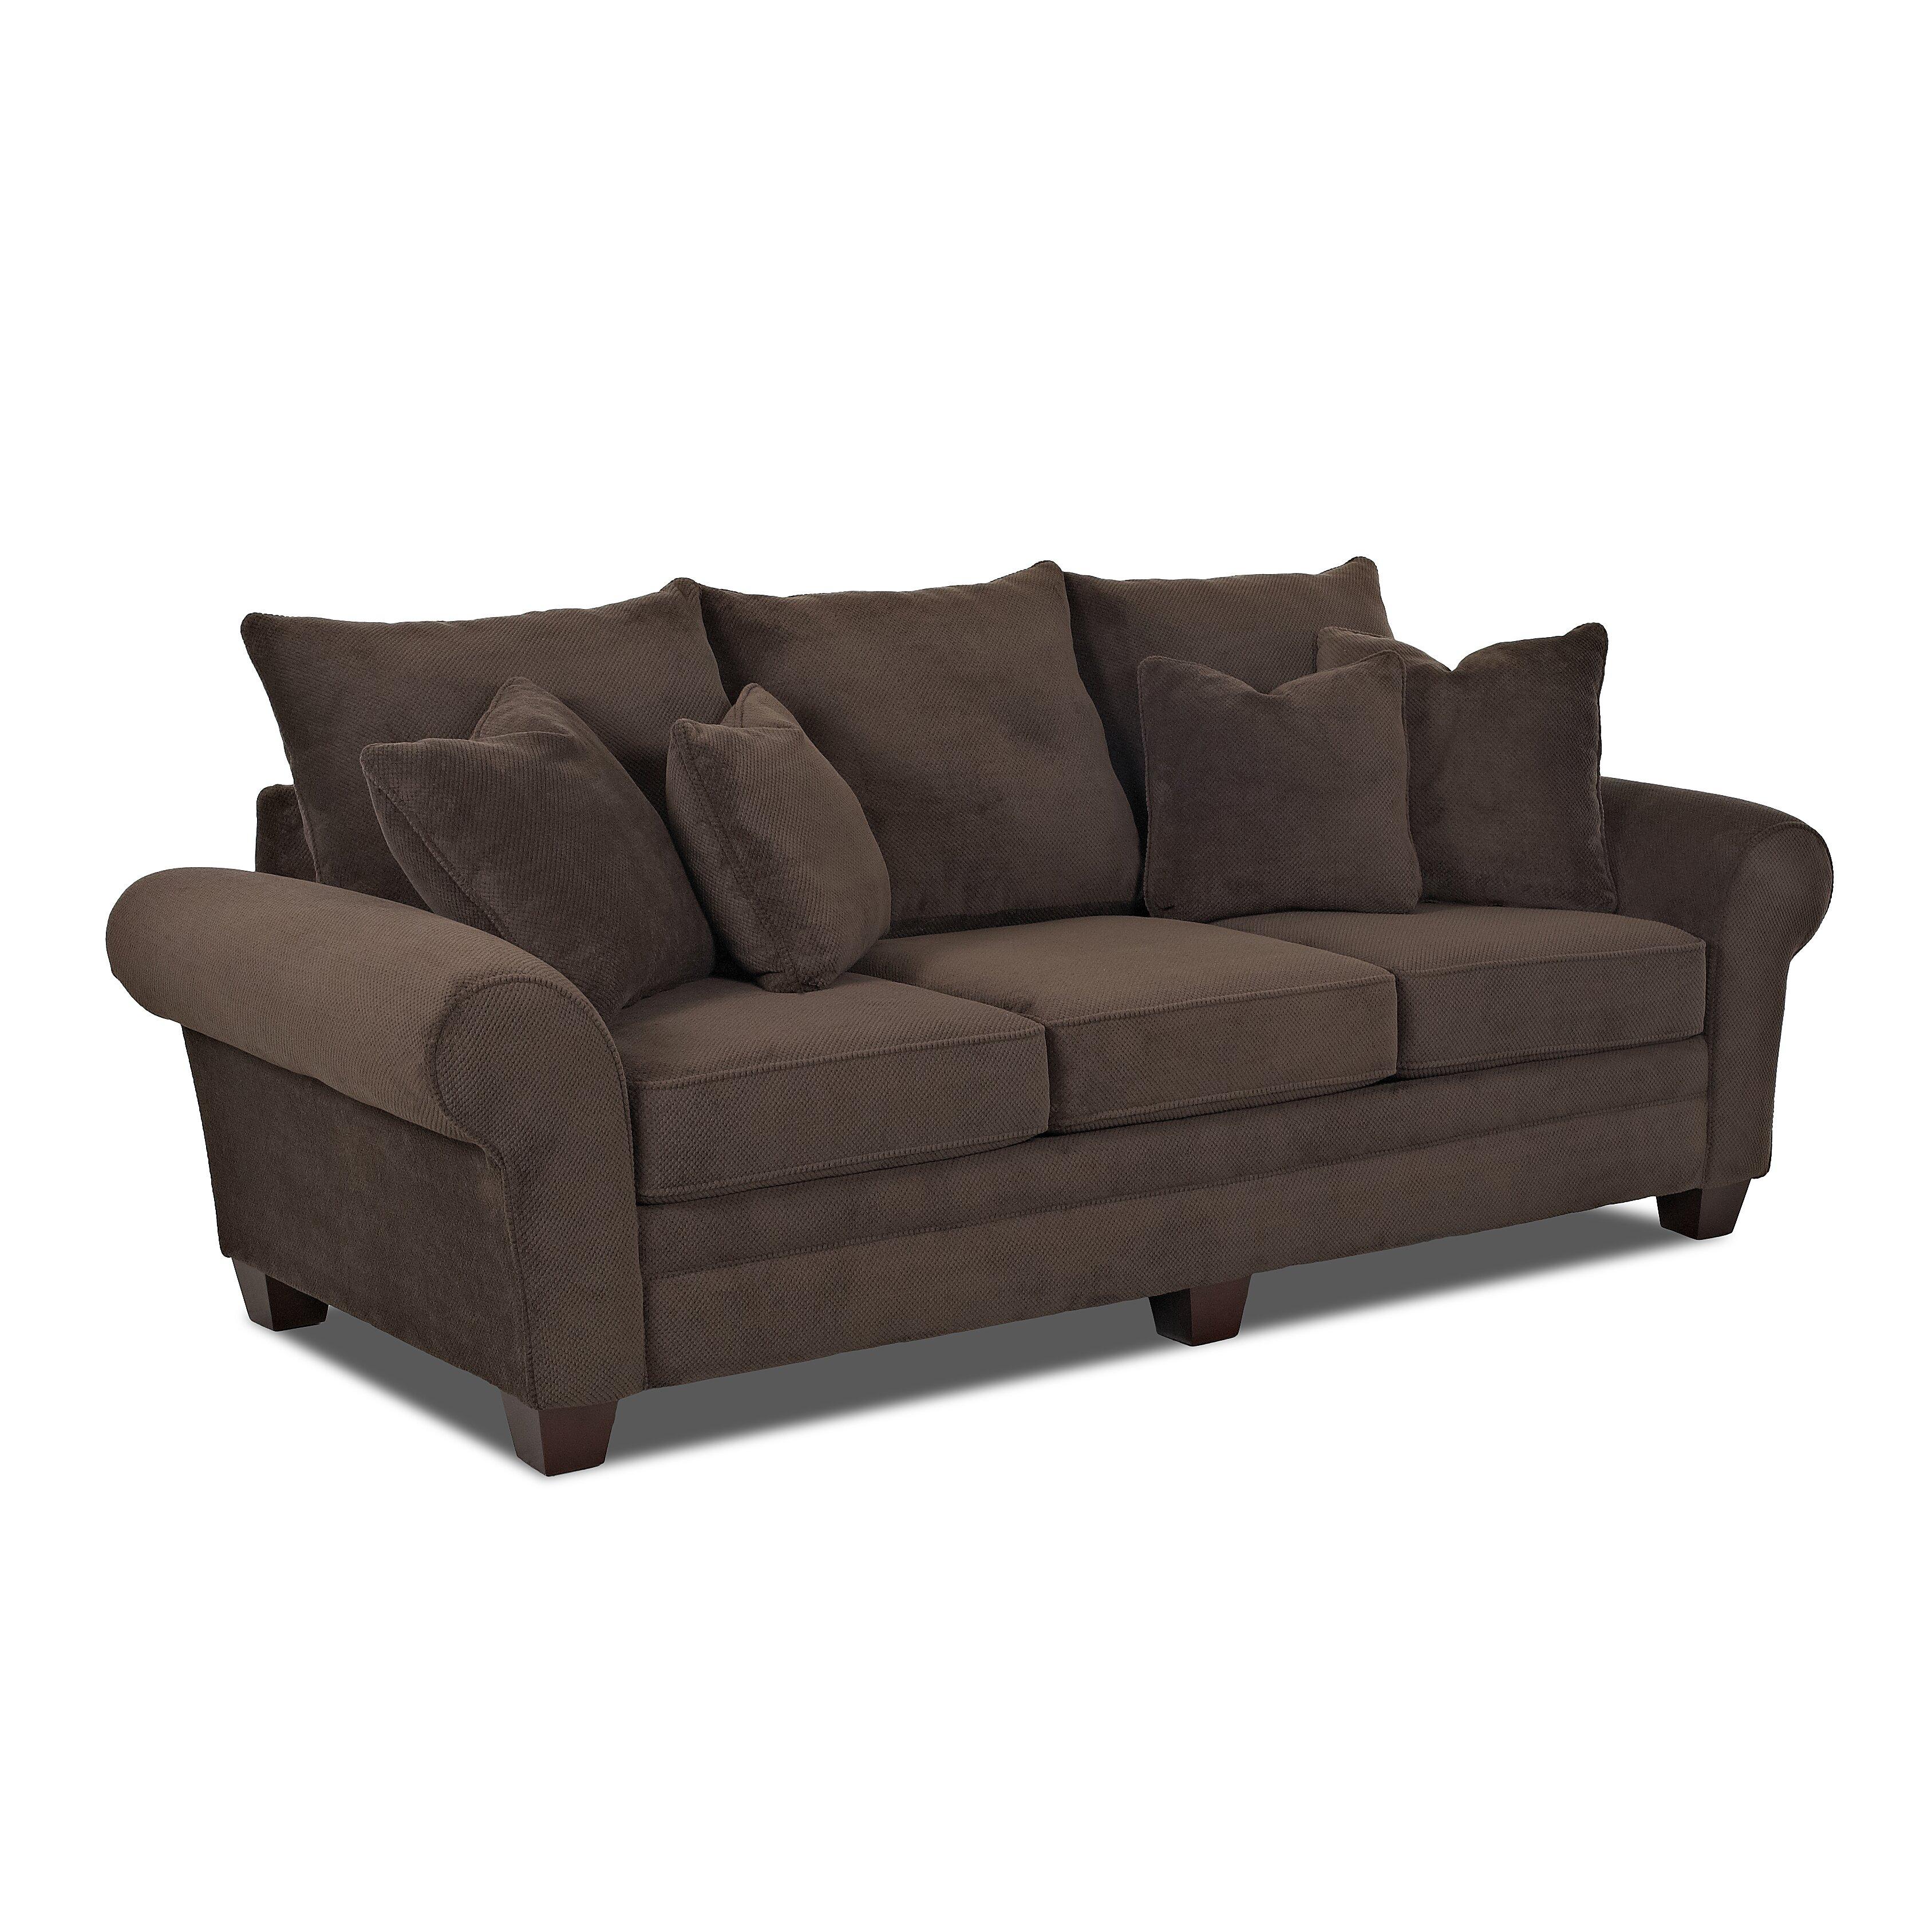 Klaussner Bedroom Furniture Klaussner Furniture Emma Sofa Wayfair